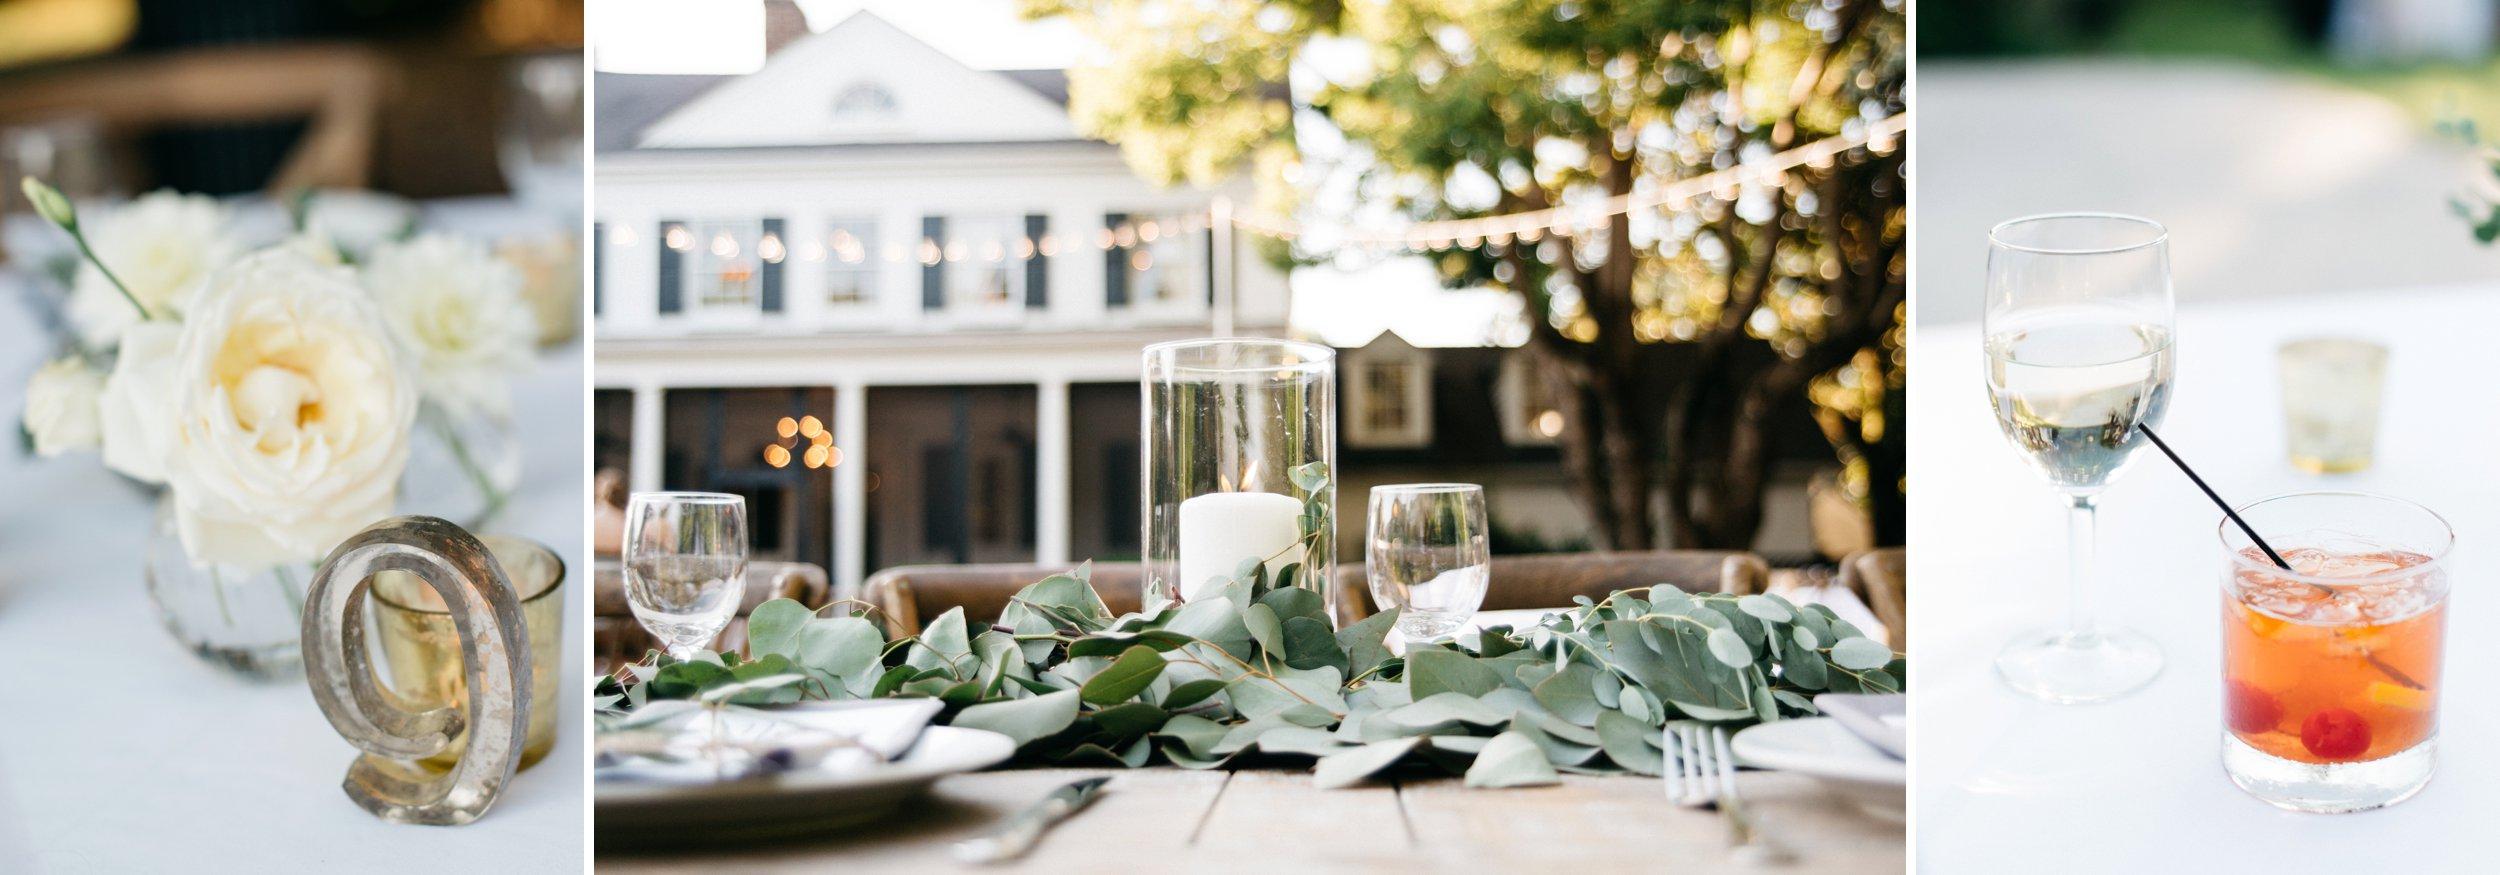 legare-waring-house-wedding-54.jpg